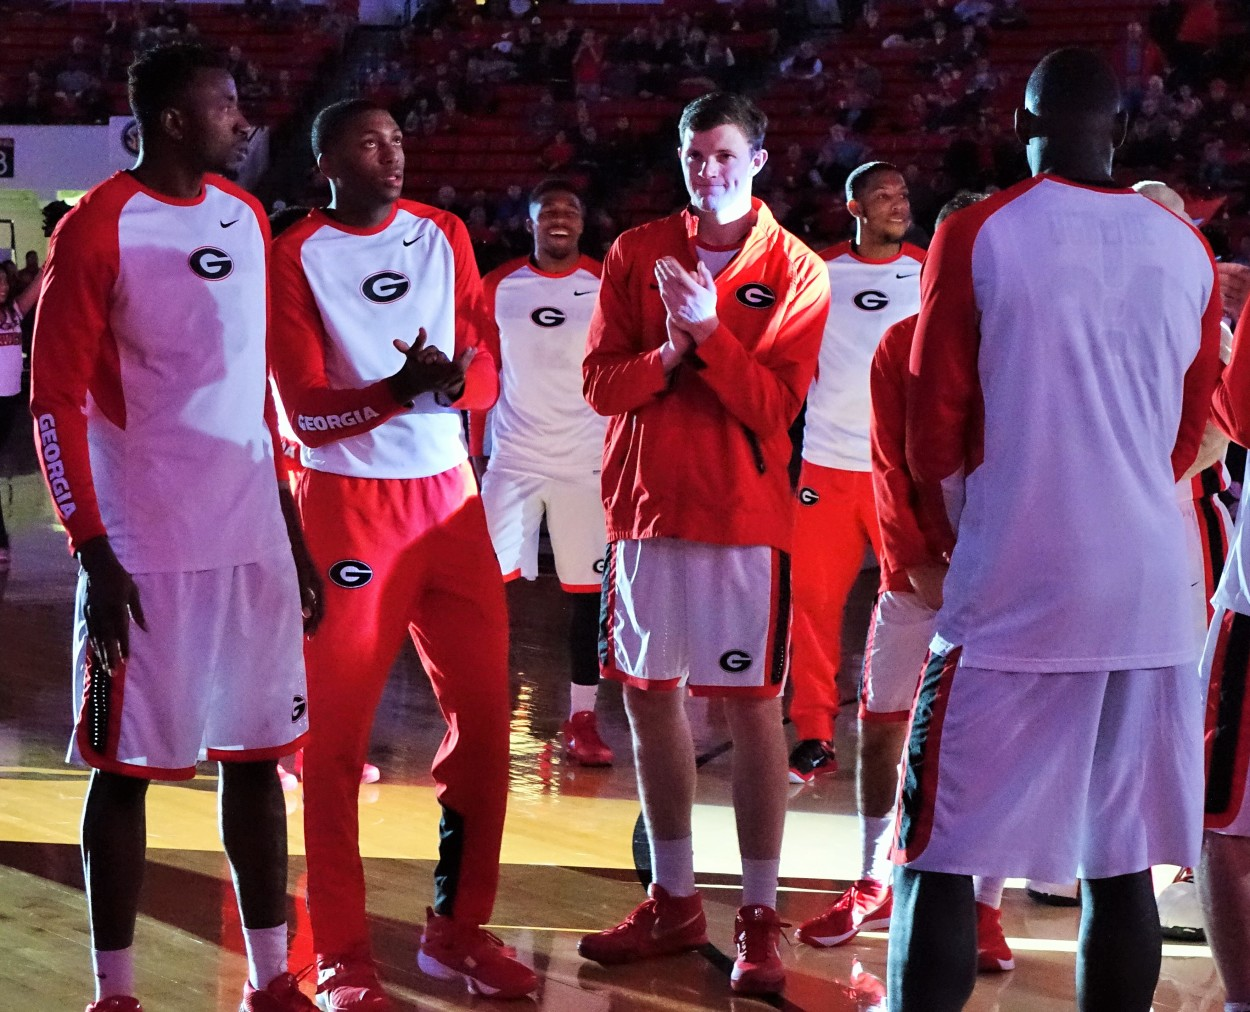 Men's basketball - Missouri vs. UGA - 06-Jan-2016 (Photo by Greg Poole)